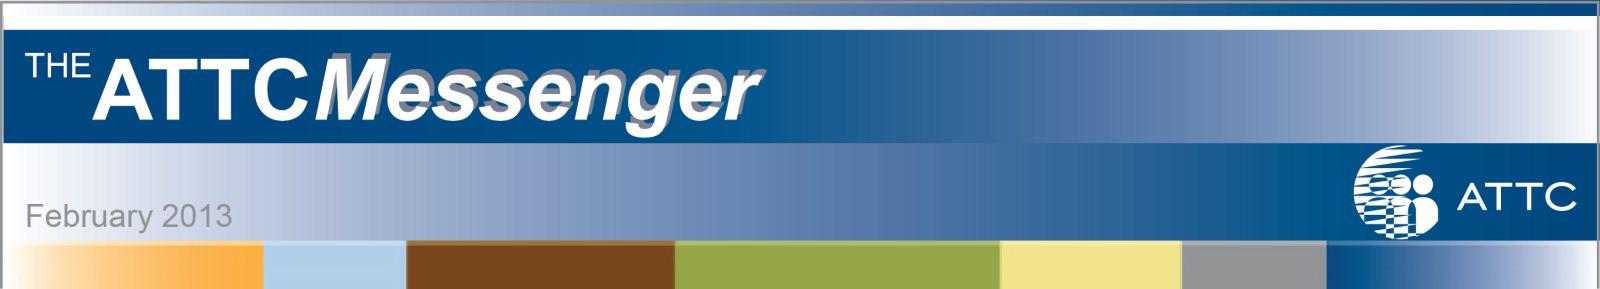 ATTC Messenger - An ATTC Network e-Publication